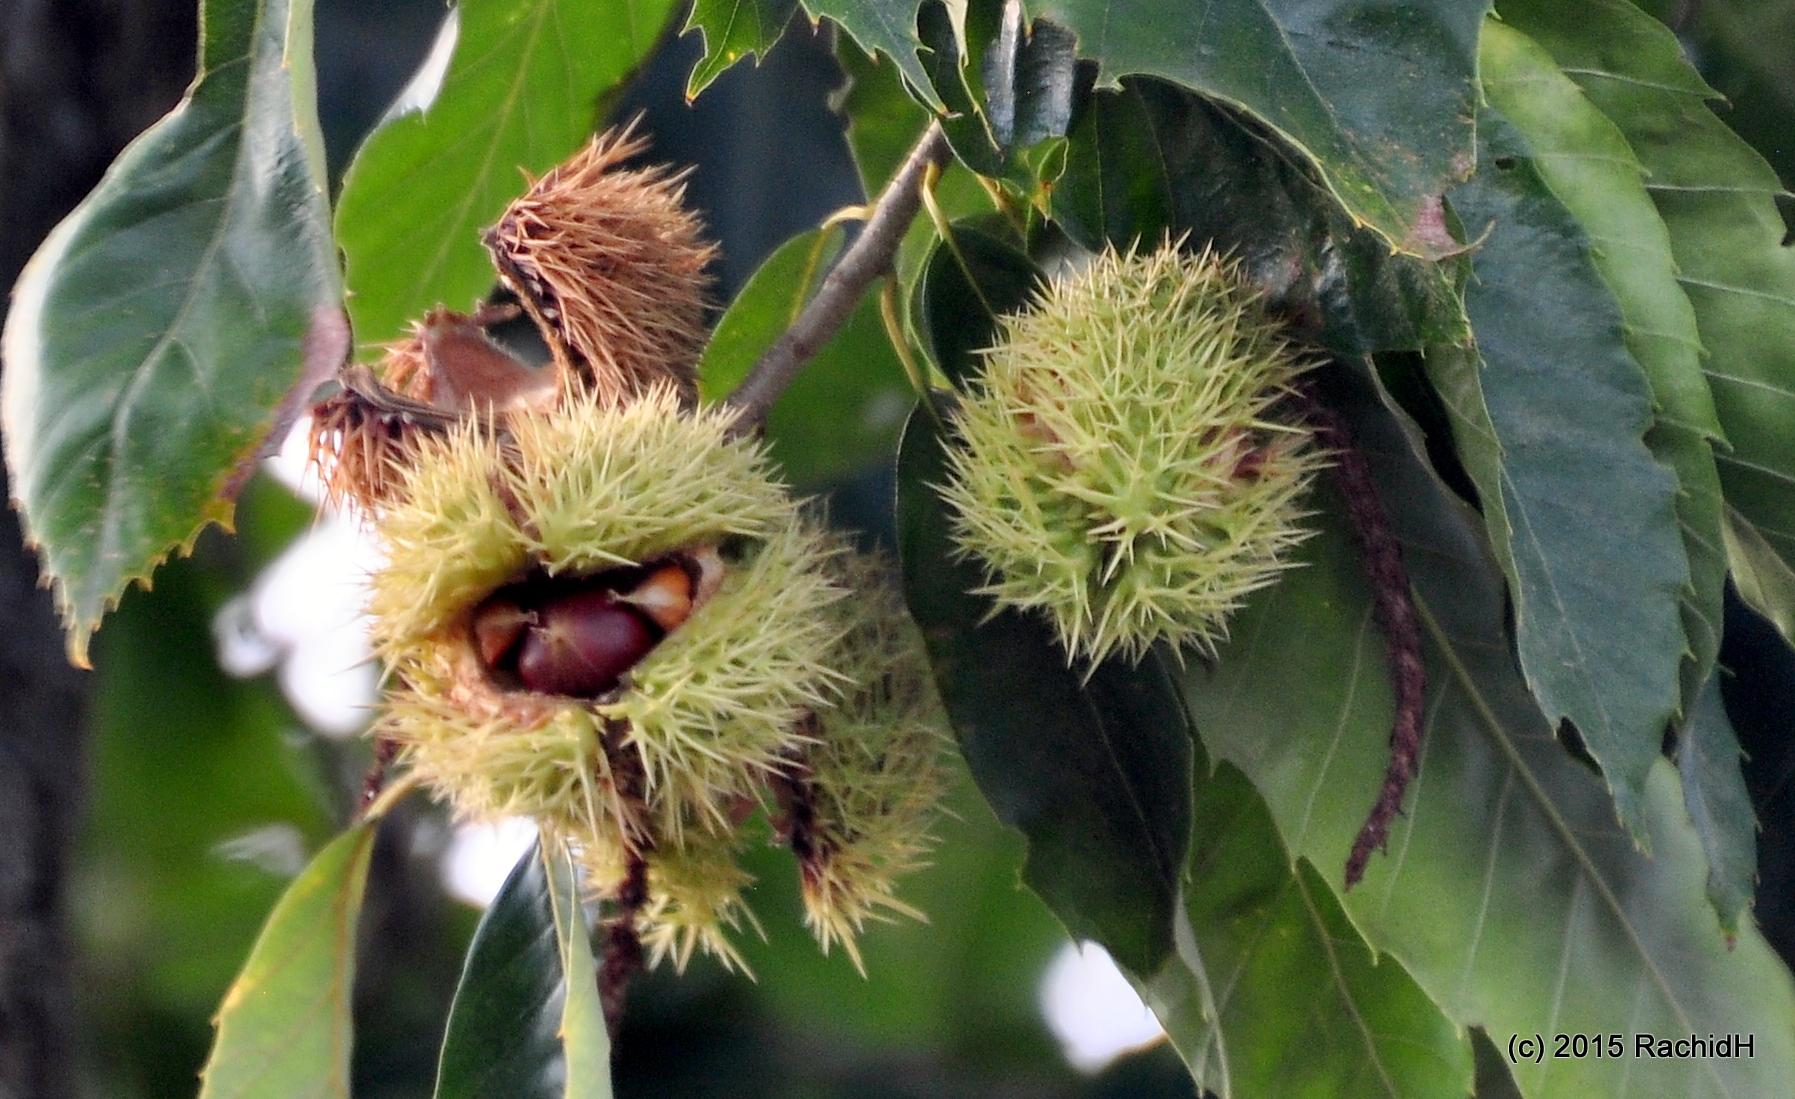 American Chestnut (Castanea dentata)